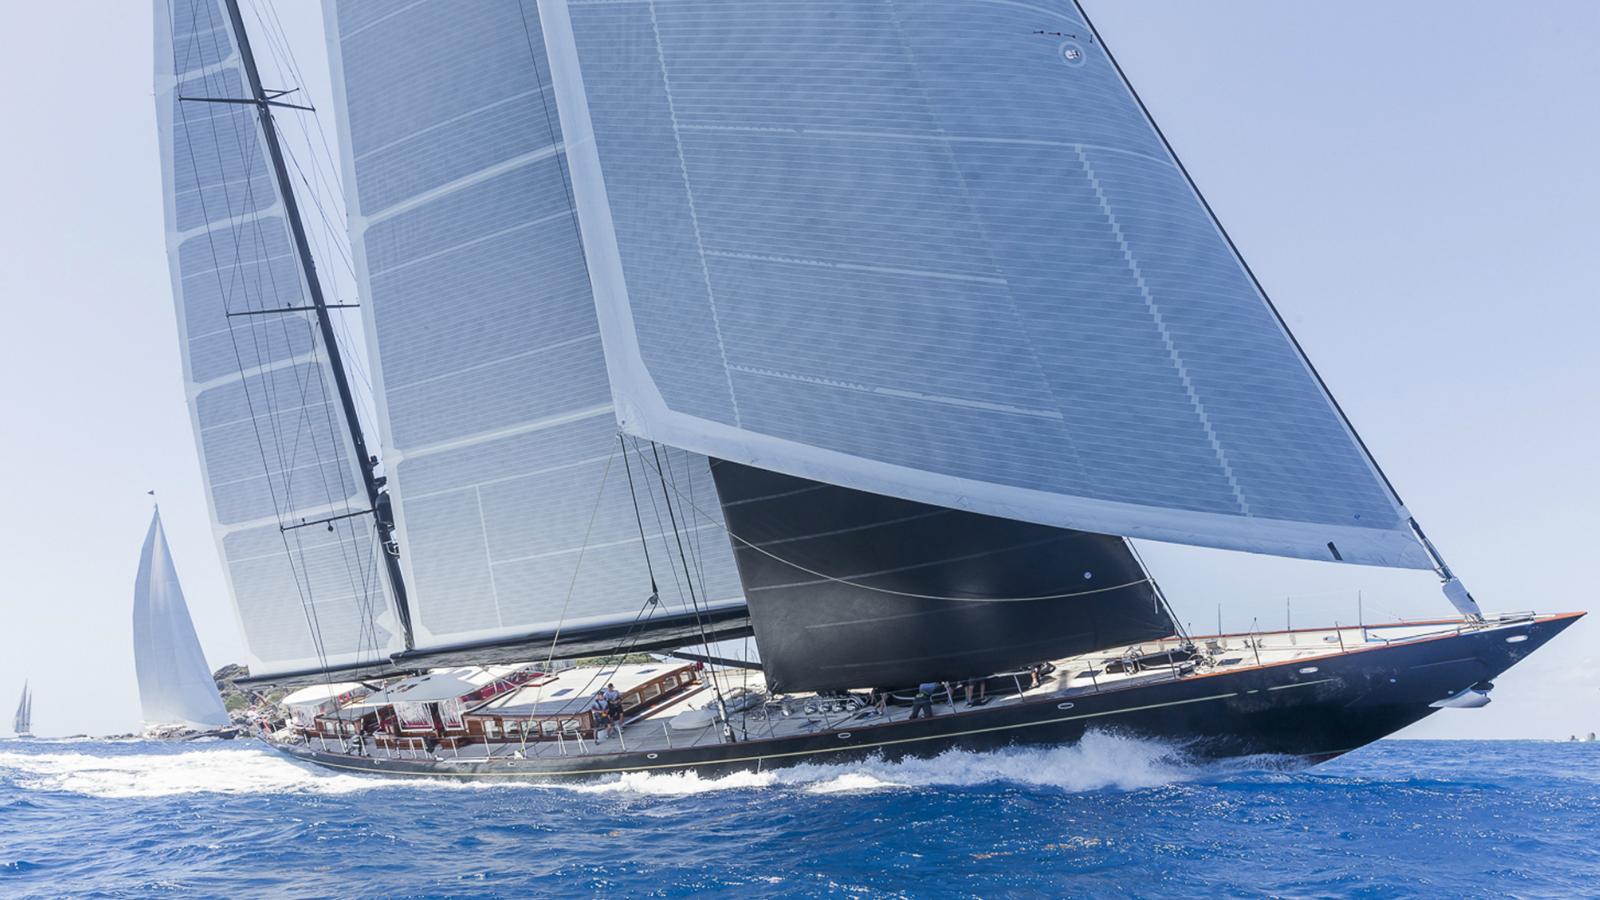 Marie-sailing-boat-luxury-yacht